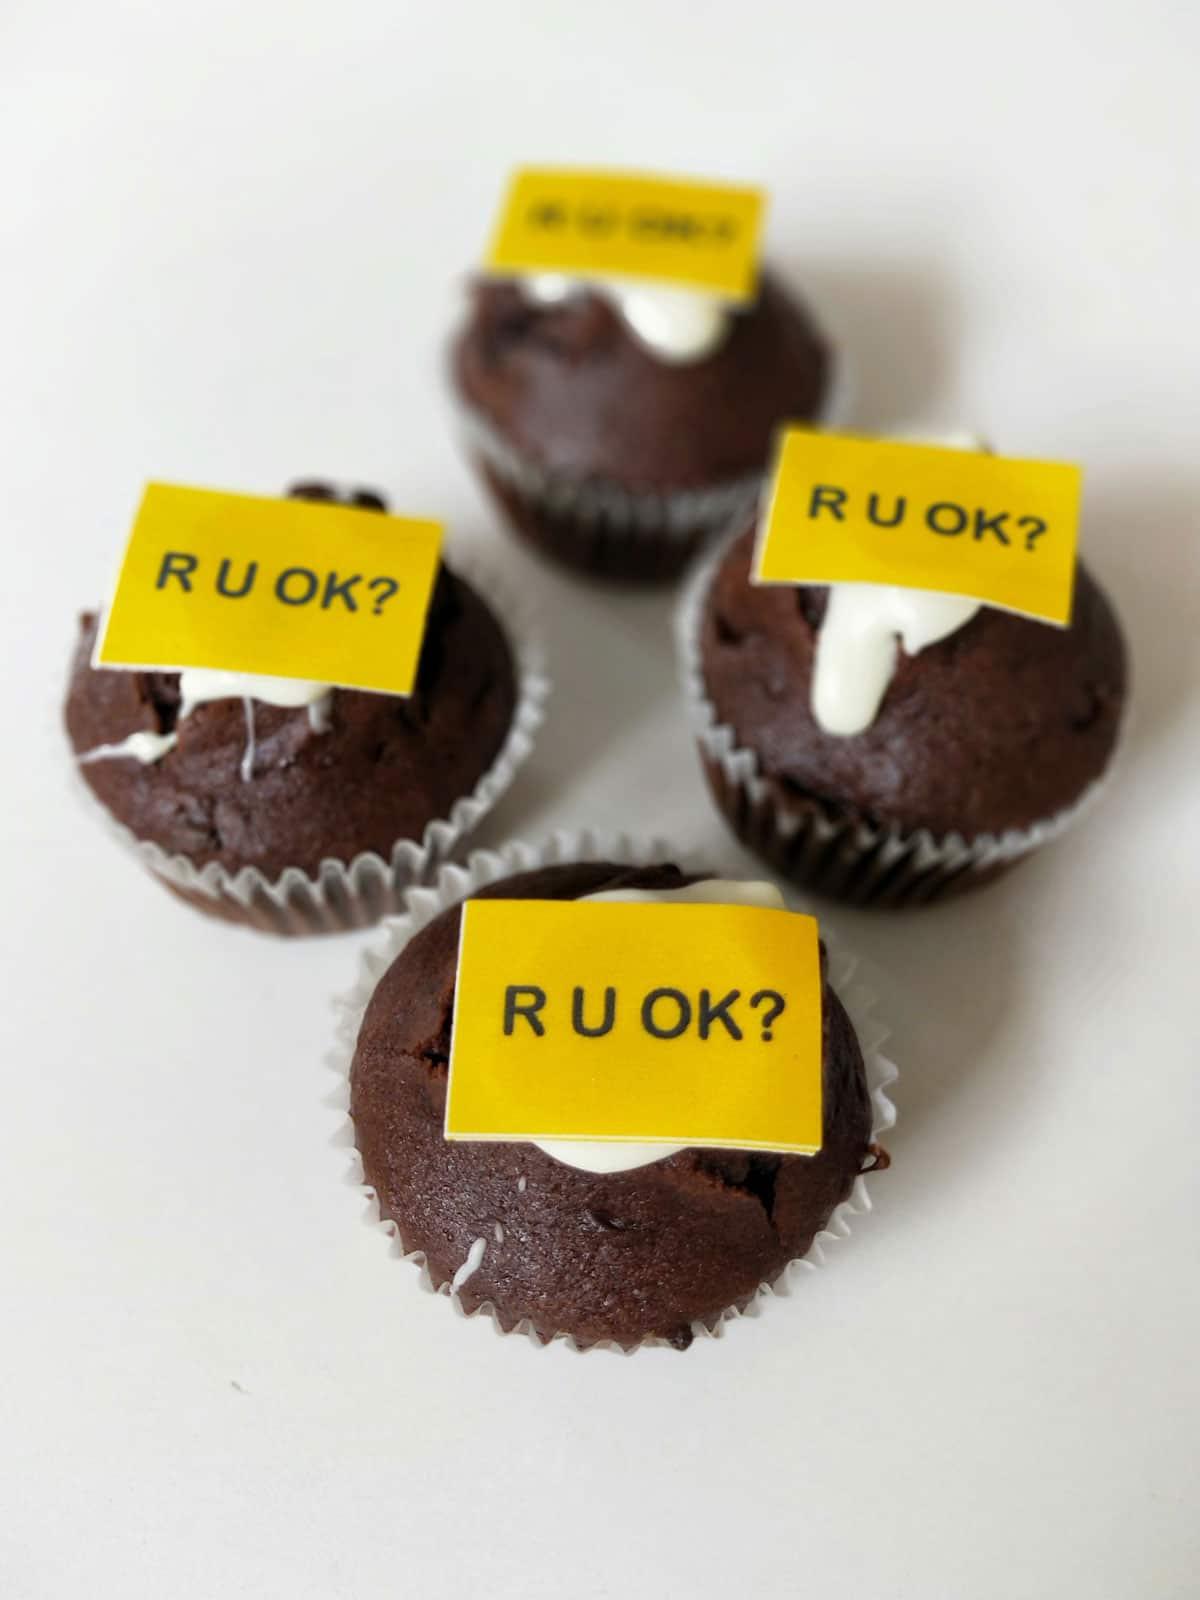 Wholesale Bespoke Custom Bakery Products Melbourne | RU OK? Day | Glenroy Bakery